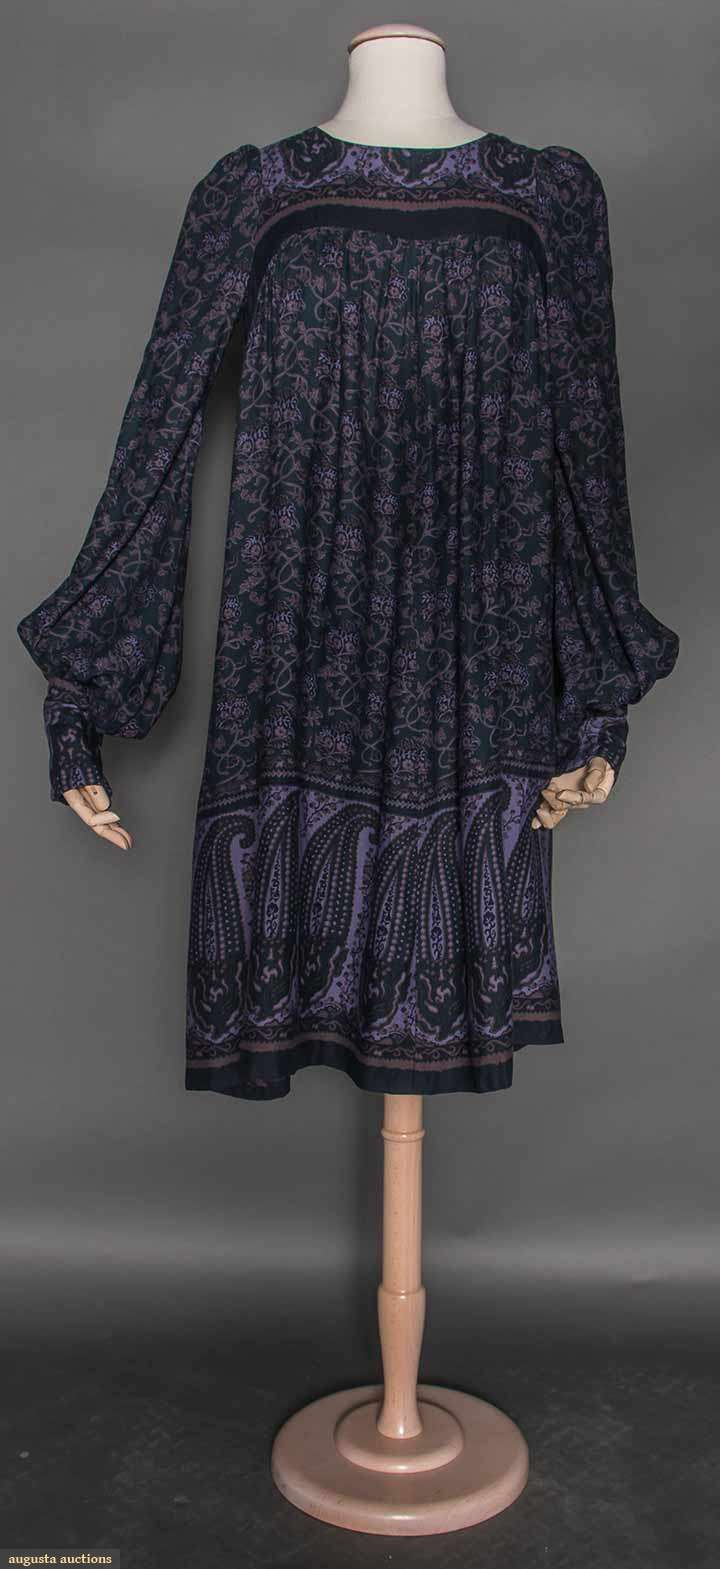 best fashion images on pinterest th century antique lace